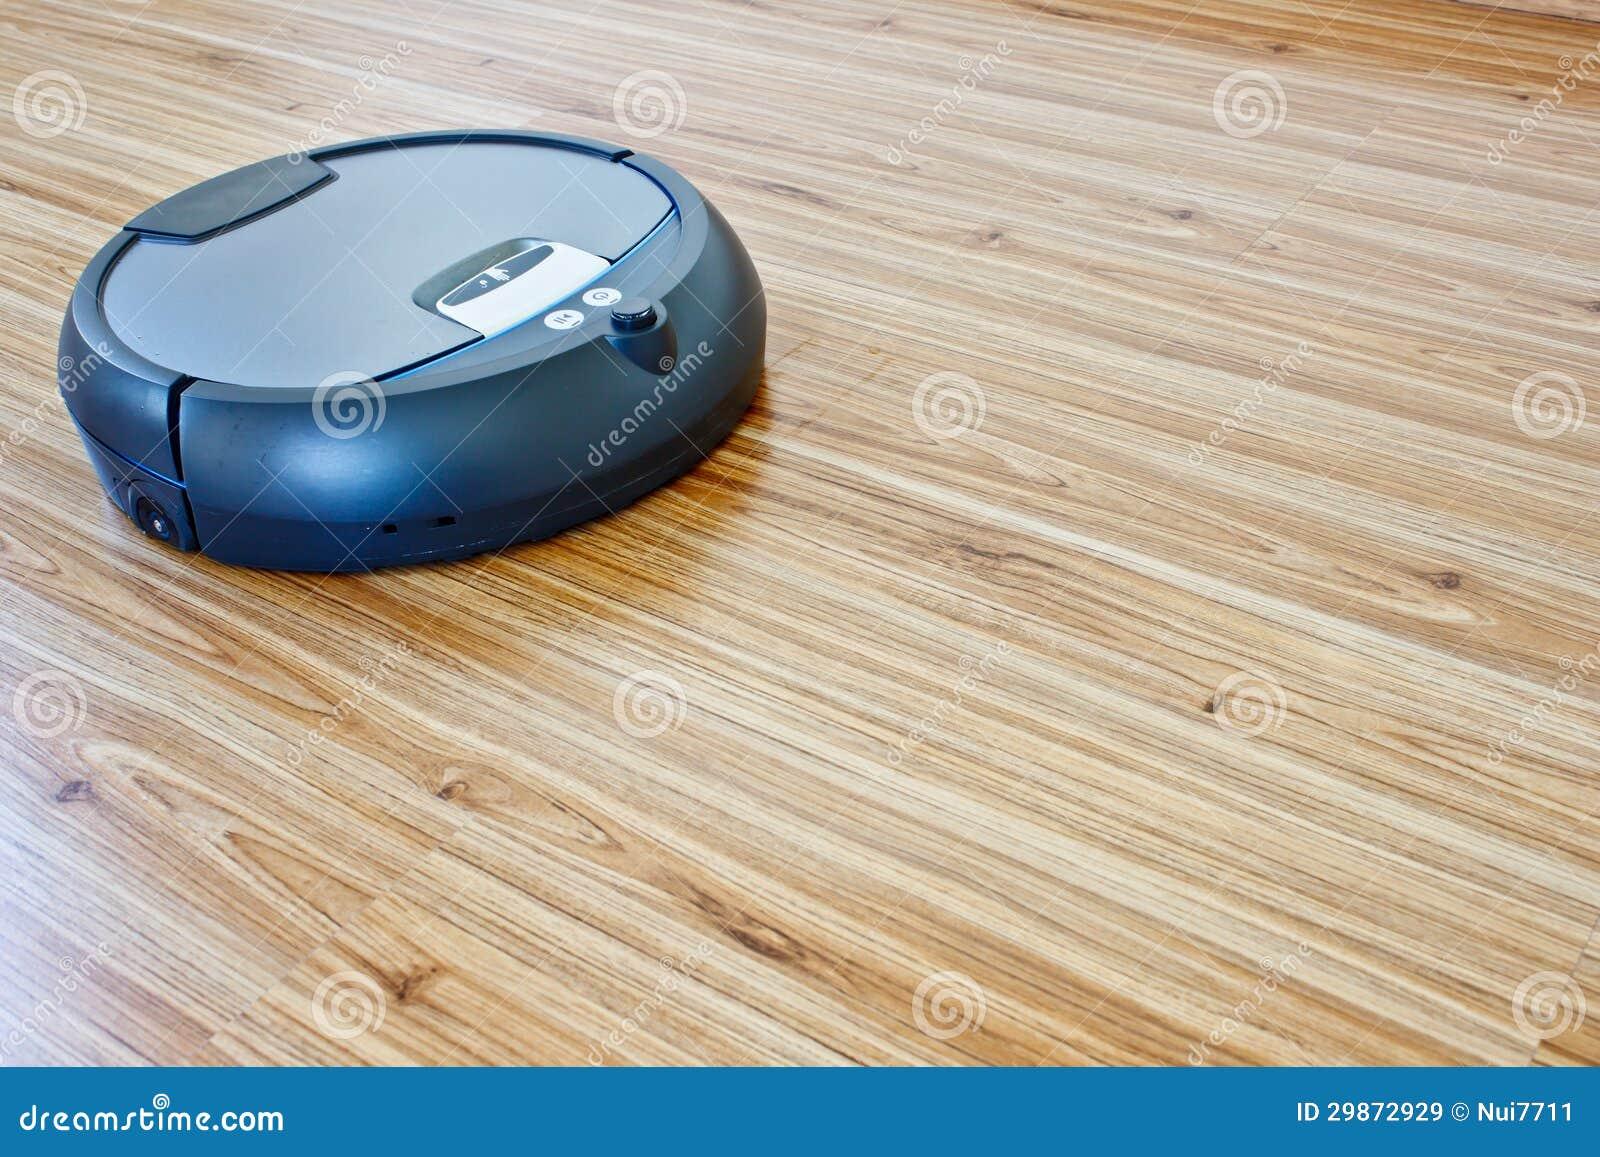 Floor washing robot 3